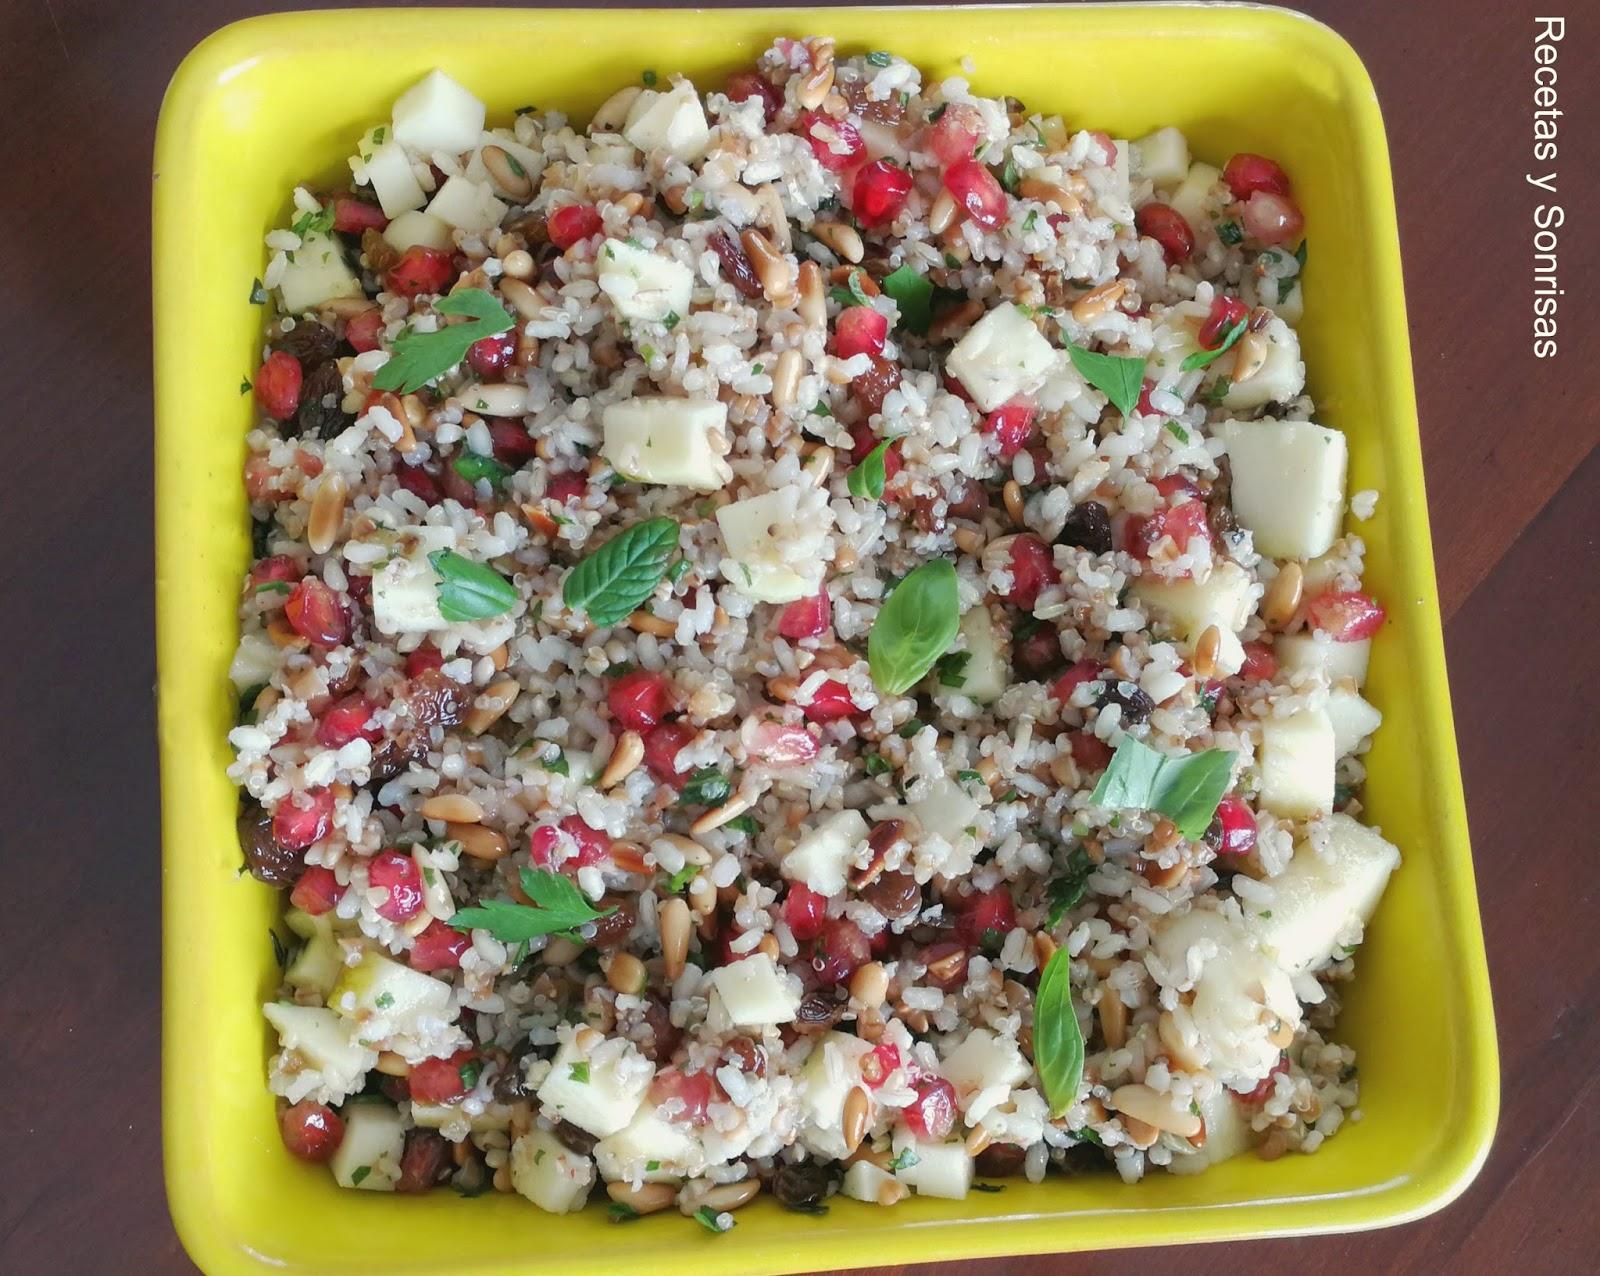 Ensalada de arroz integral con quinoa granada manzana - Ensalada de arroz light ...